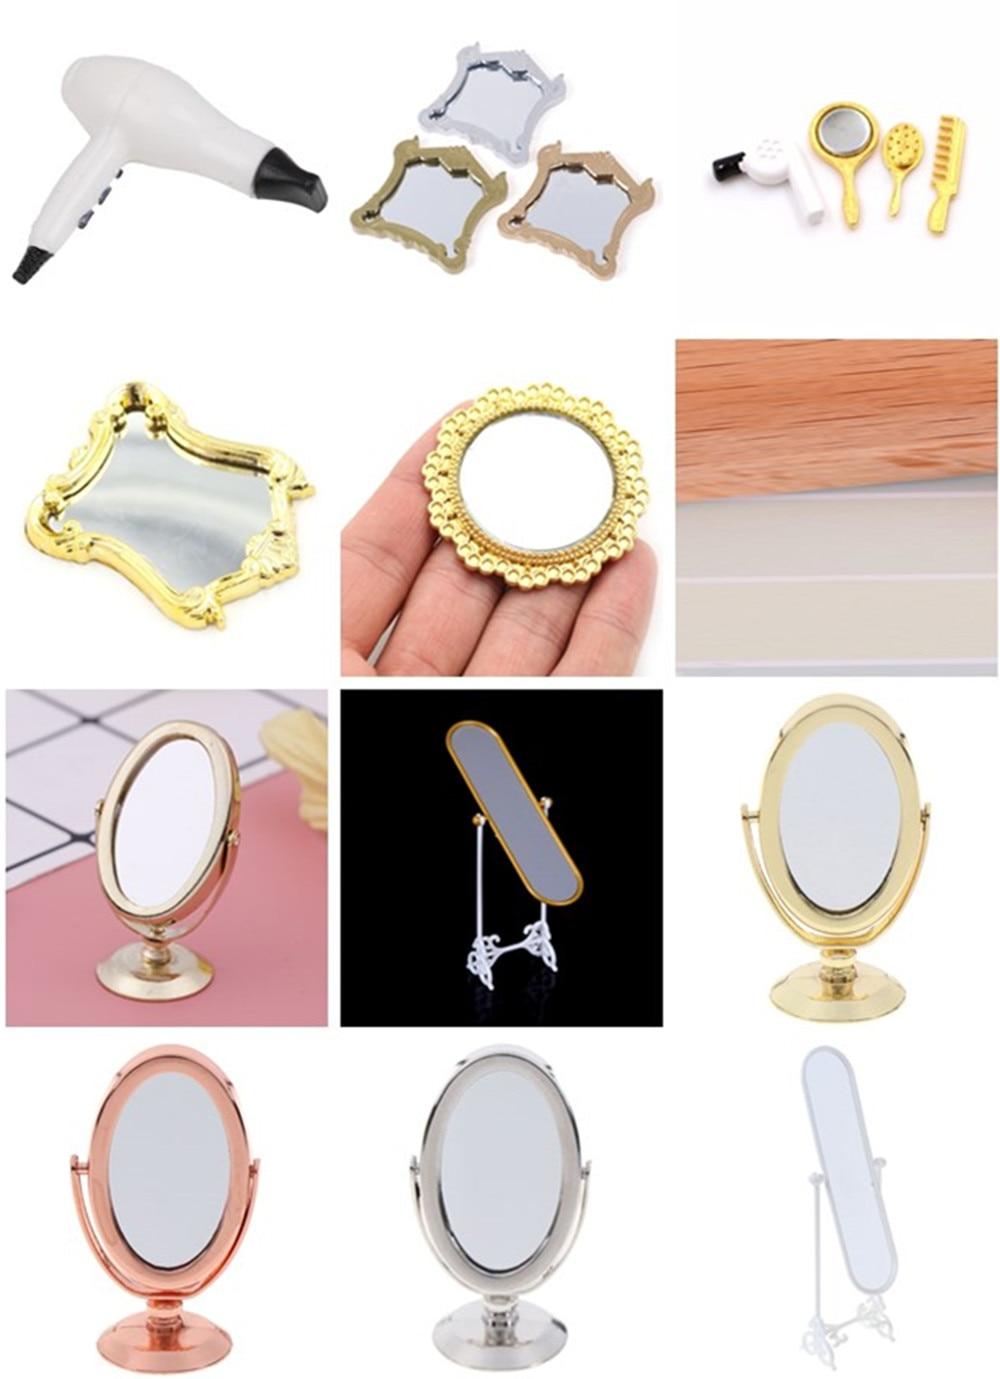 1pc Plastic Mirror Dollhouse Furniture Plastic Comb Hair Dryer Mirror Frame Mirror Accessories Doll House Miniatures 1:12 1:12